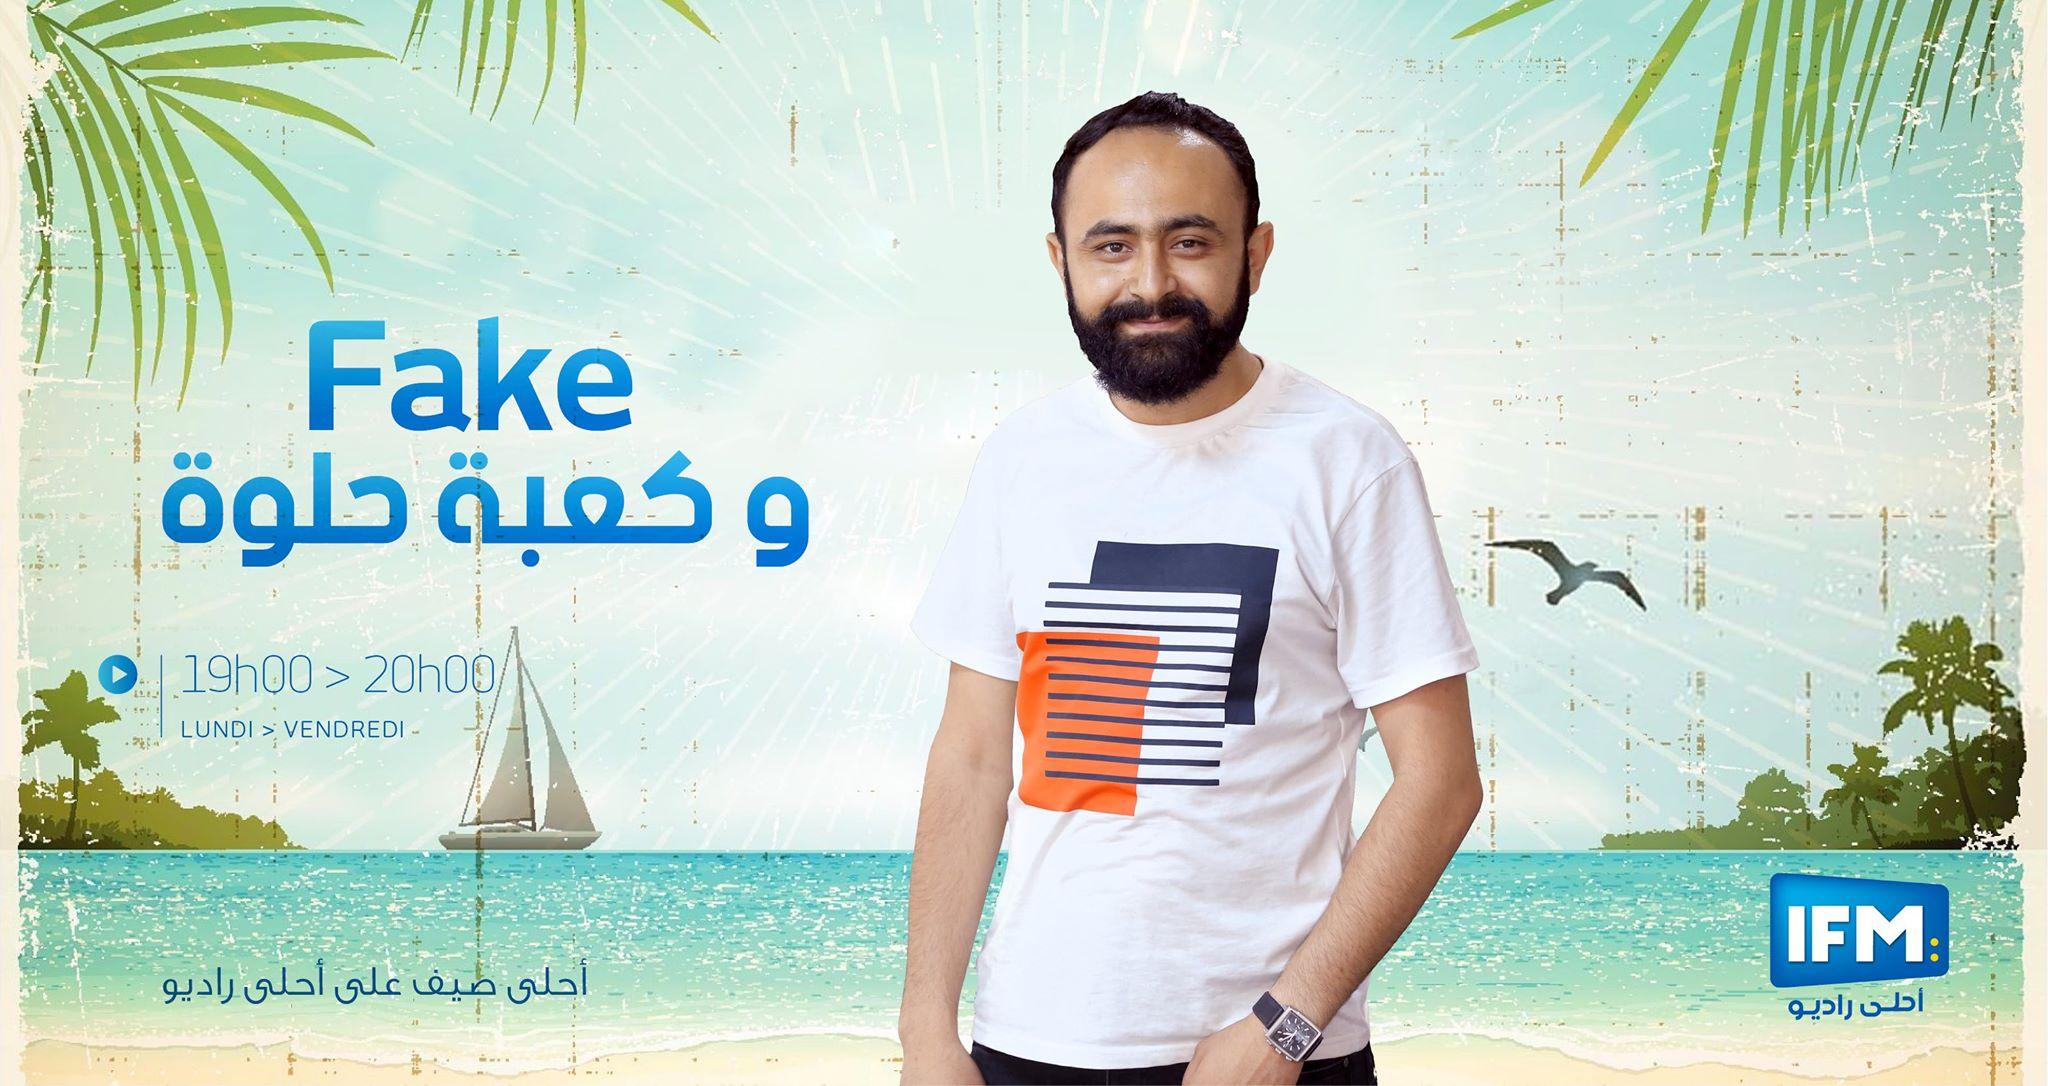 fake w ka3ba 7alwa